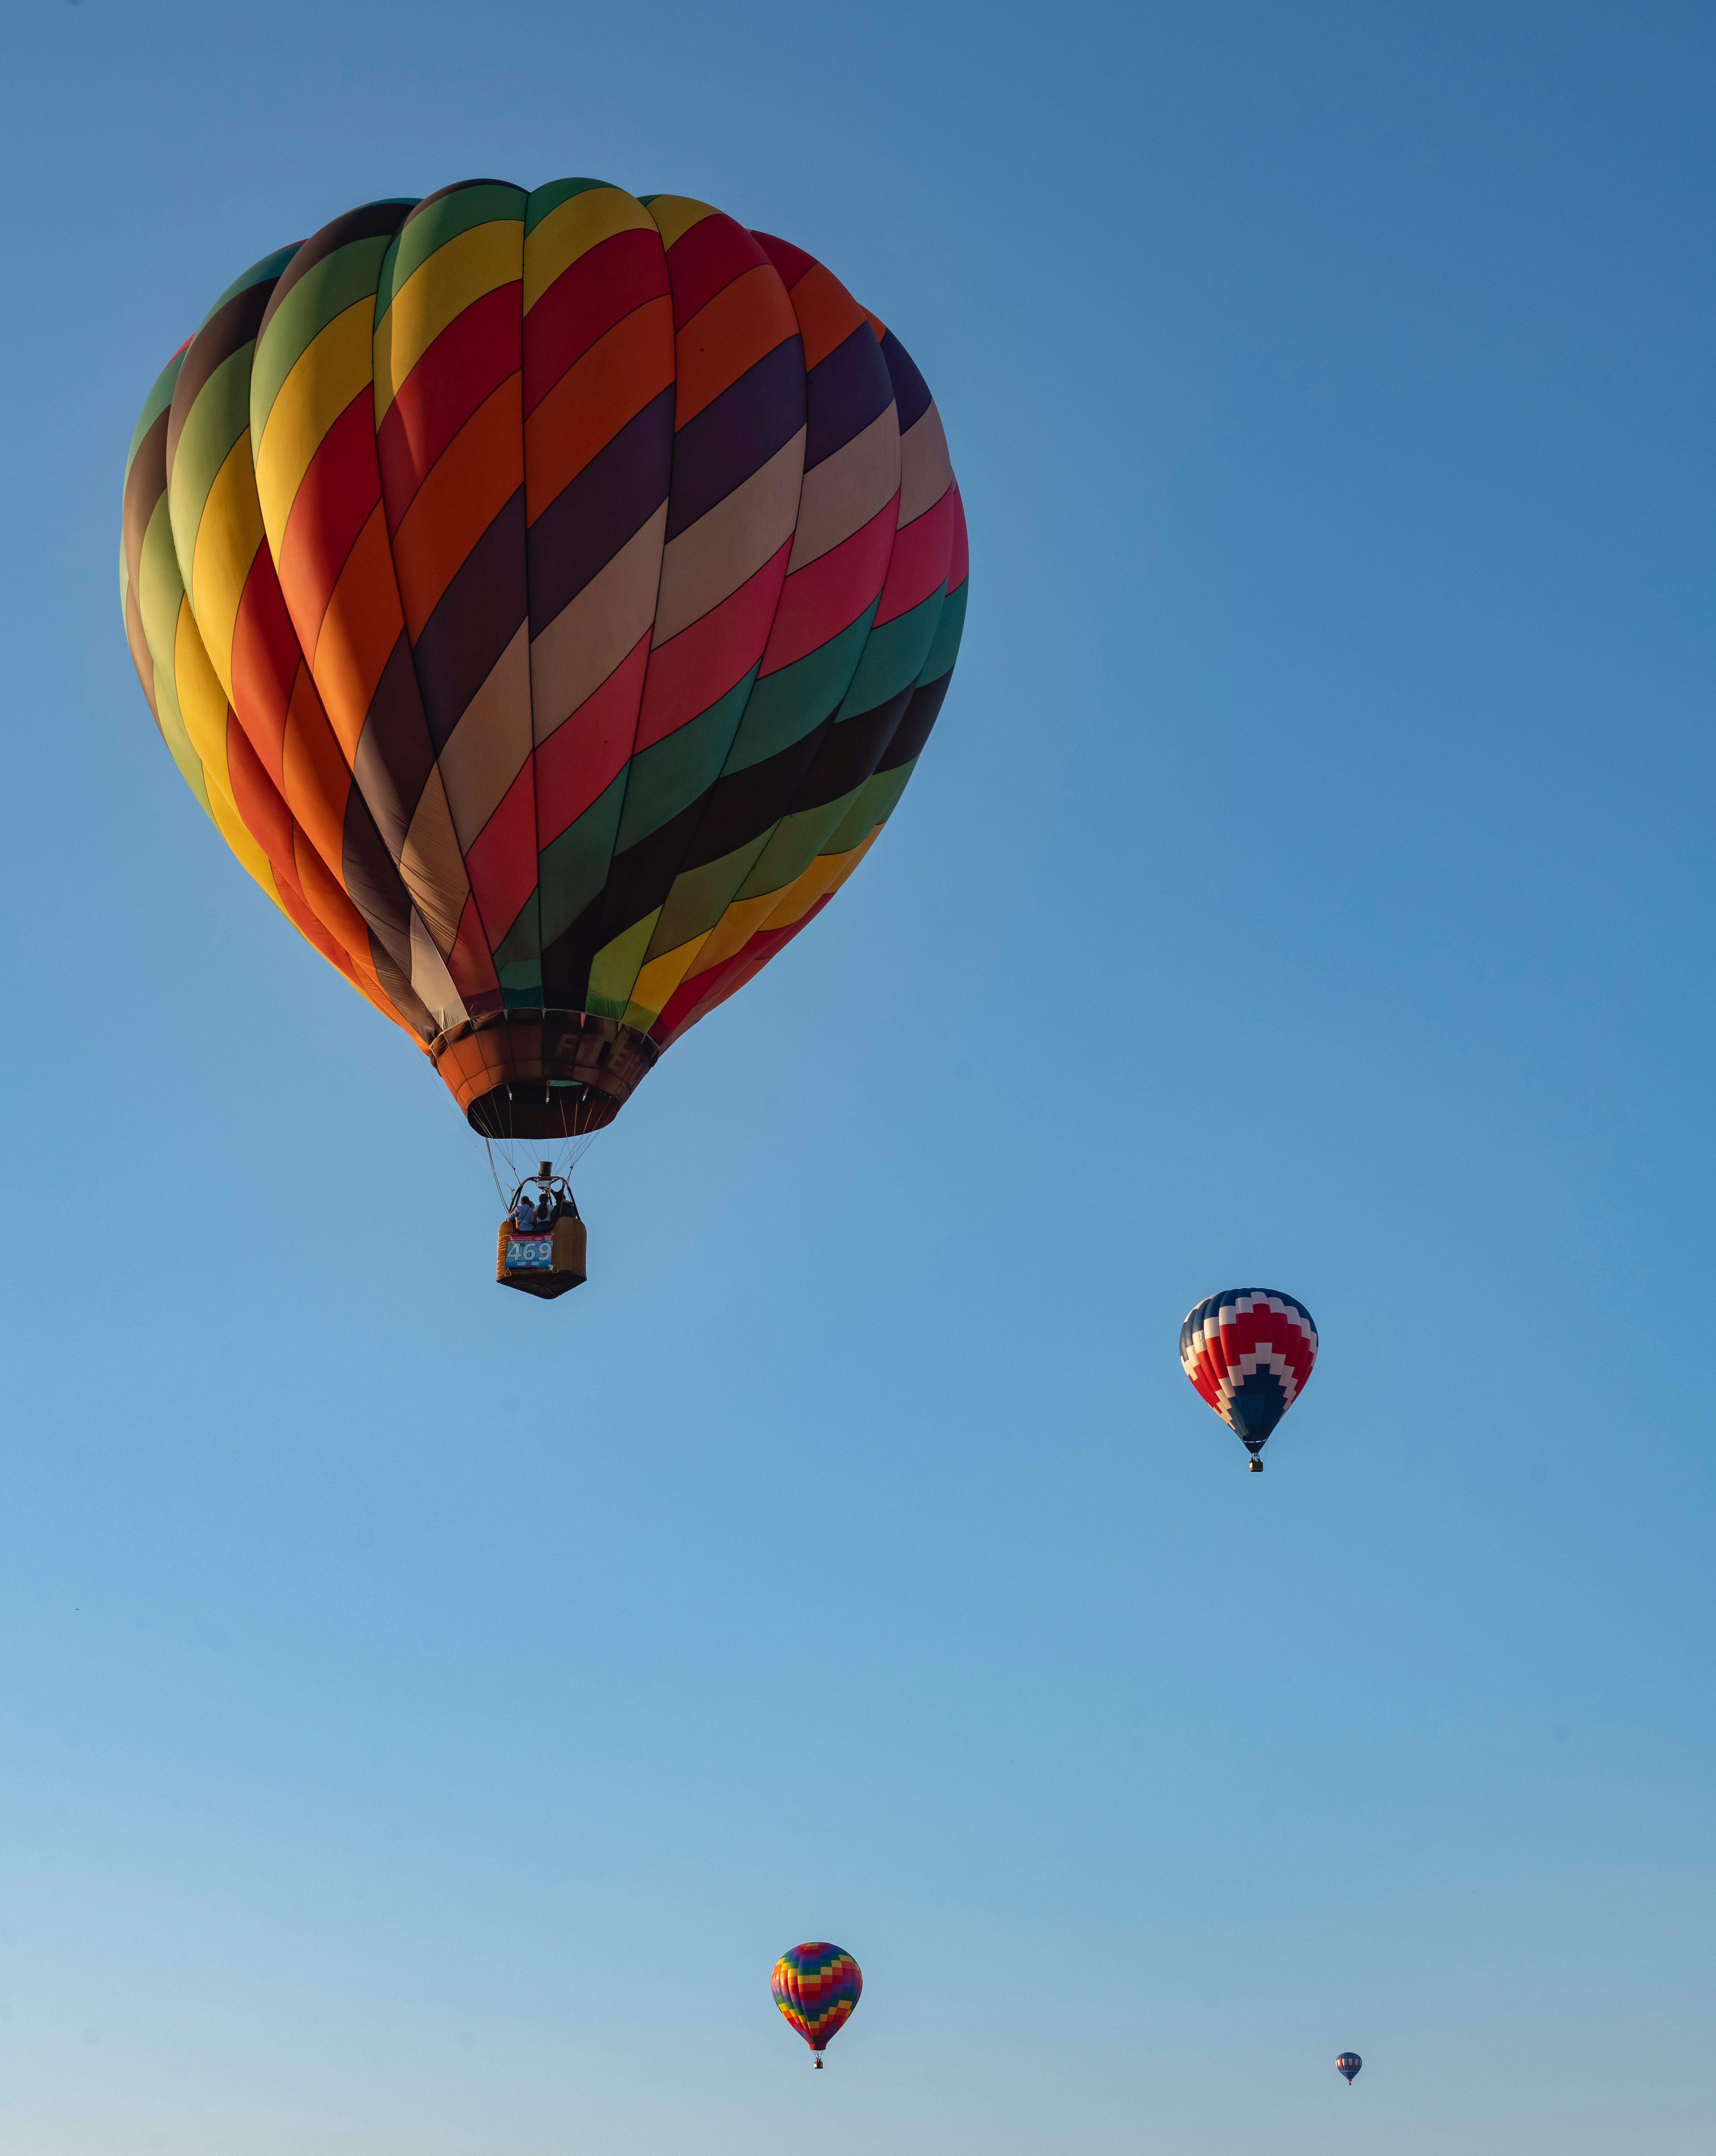 Ballons: Um nach oben zu kommen, muss man Ballast abwerfen!